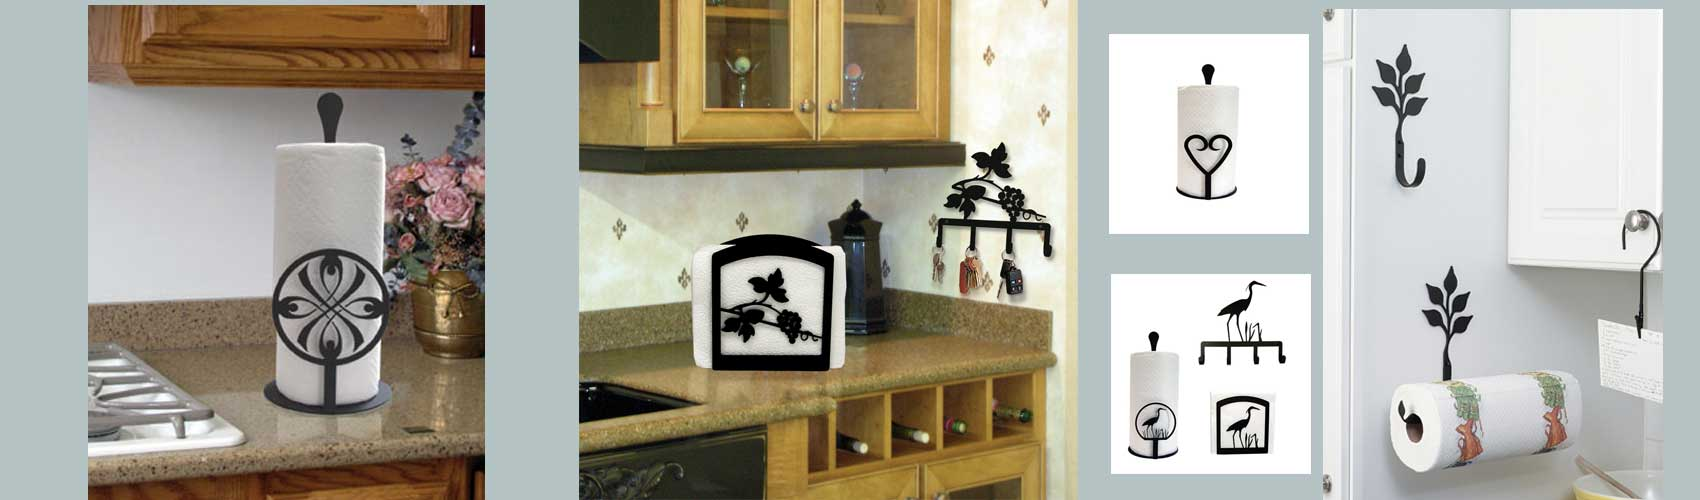 counter-kitchen-decor